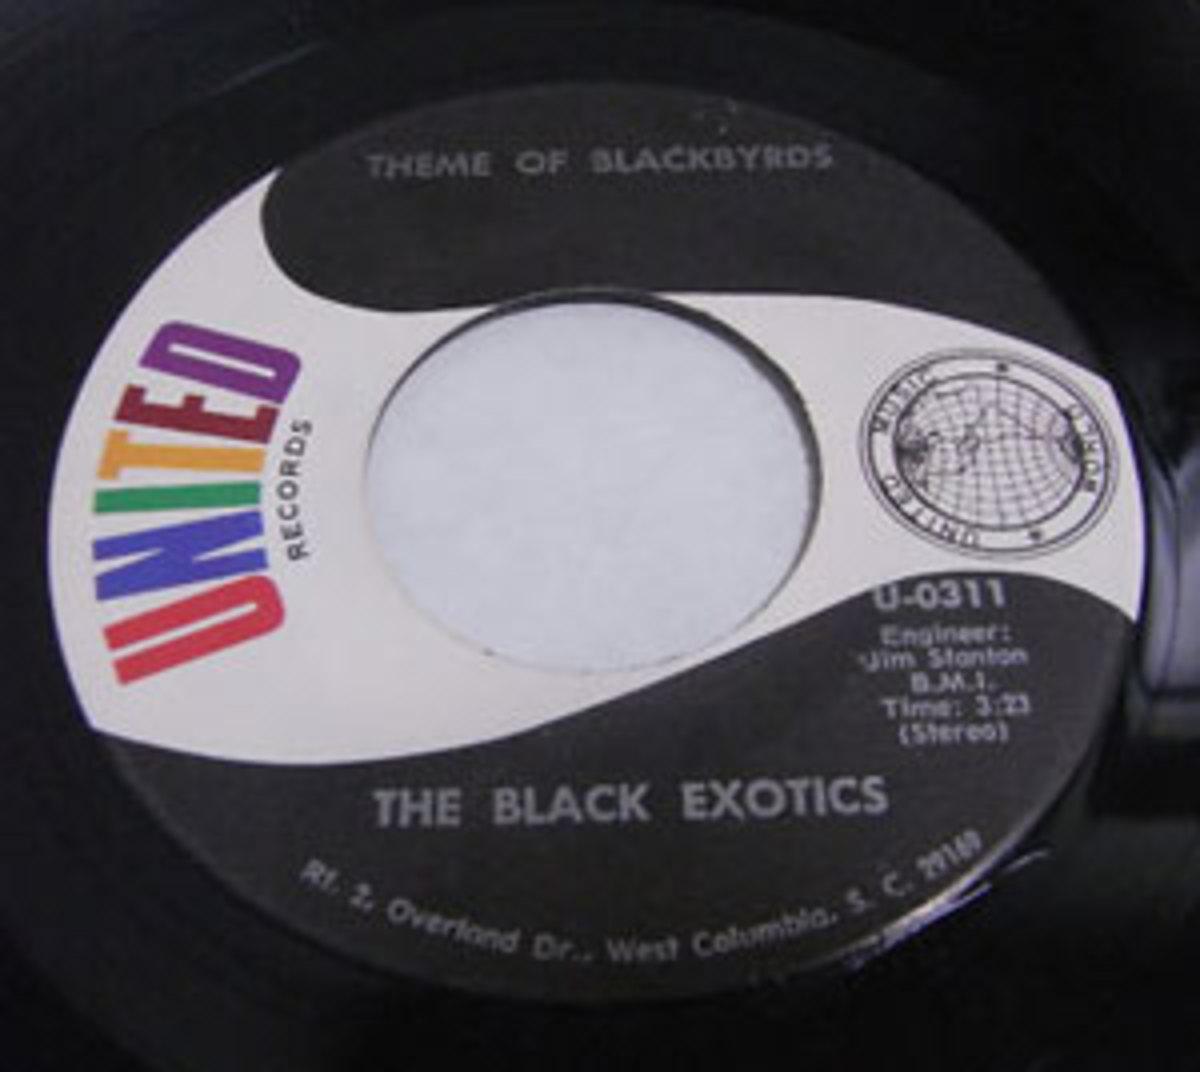 5. The Black Exotics 45.